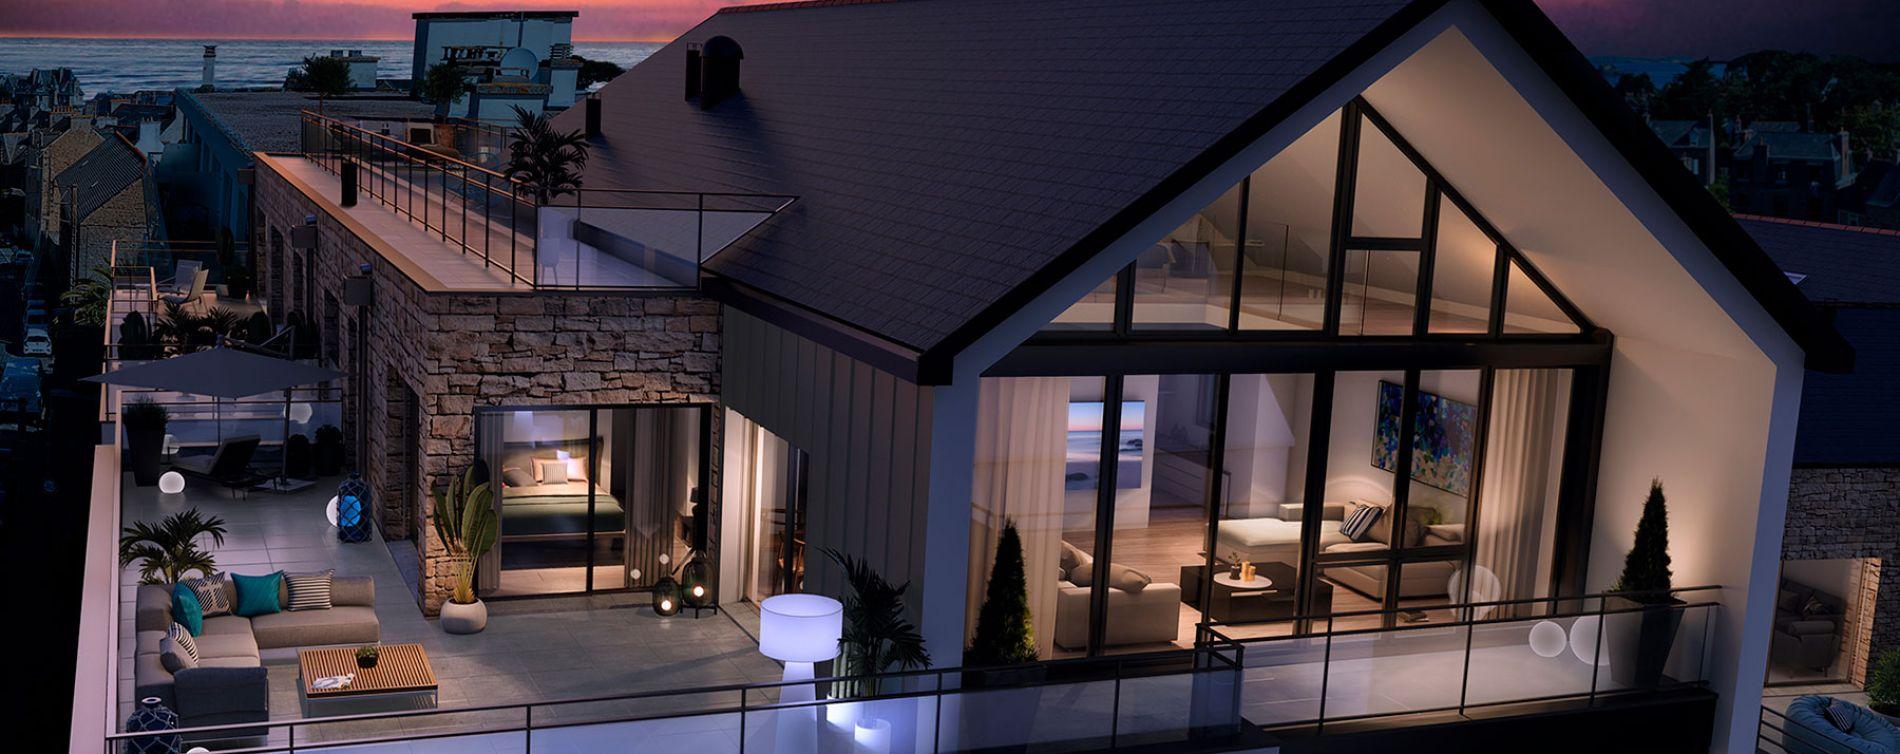 Dinard : programme immobilier neuve « Saint Eno Bay » (3)